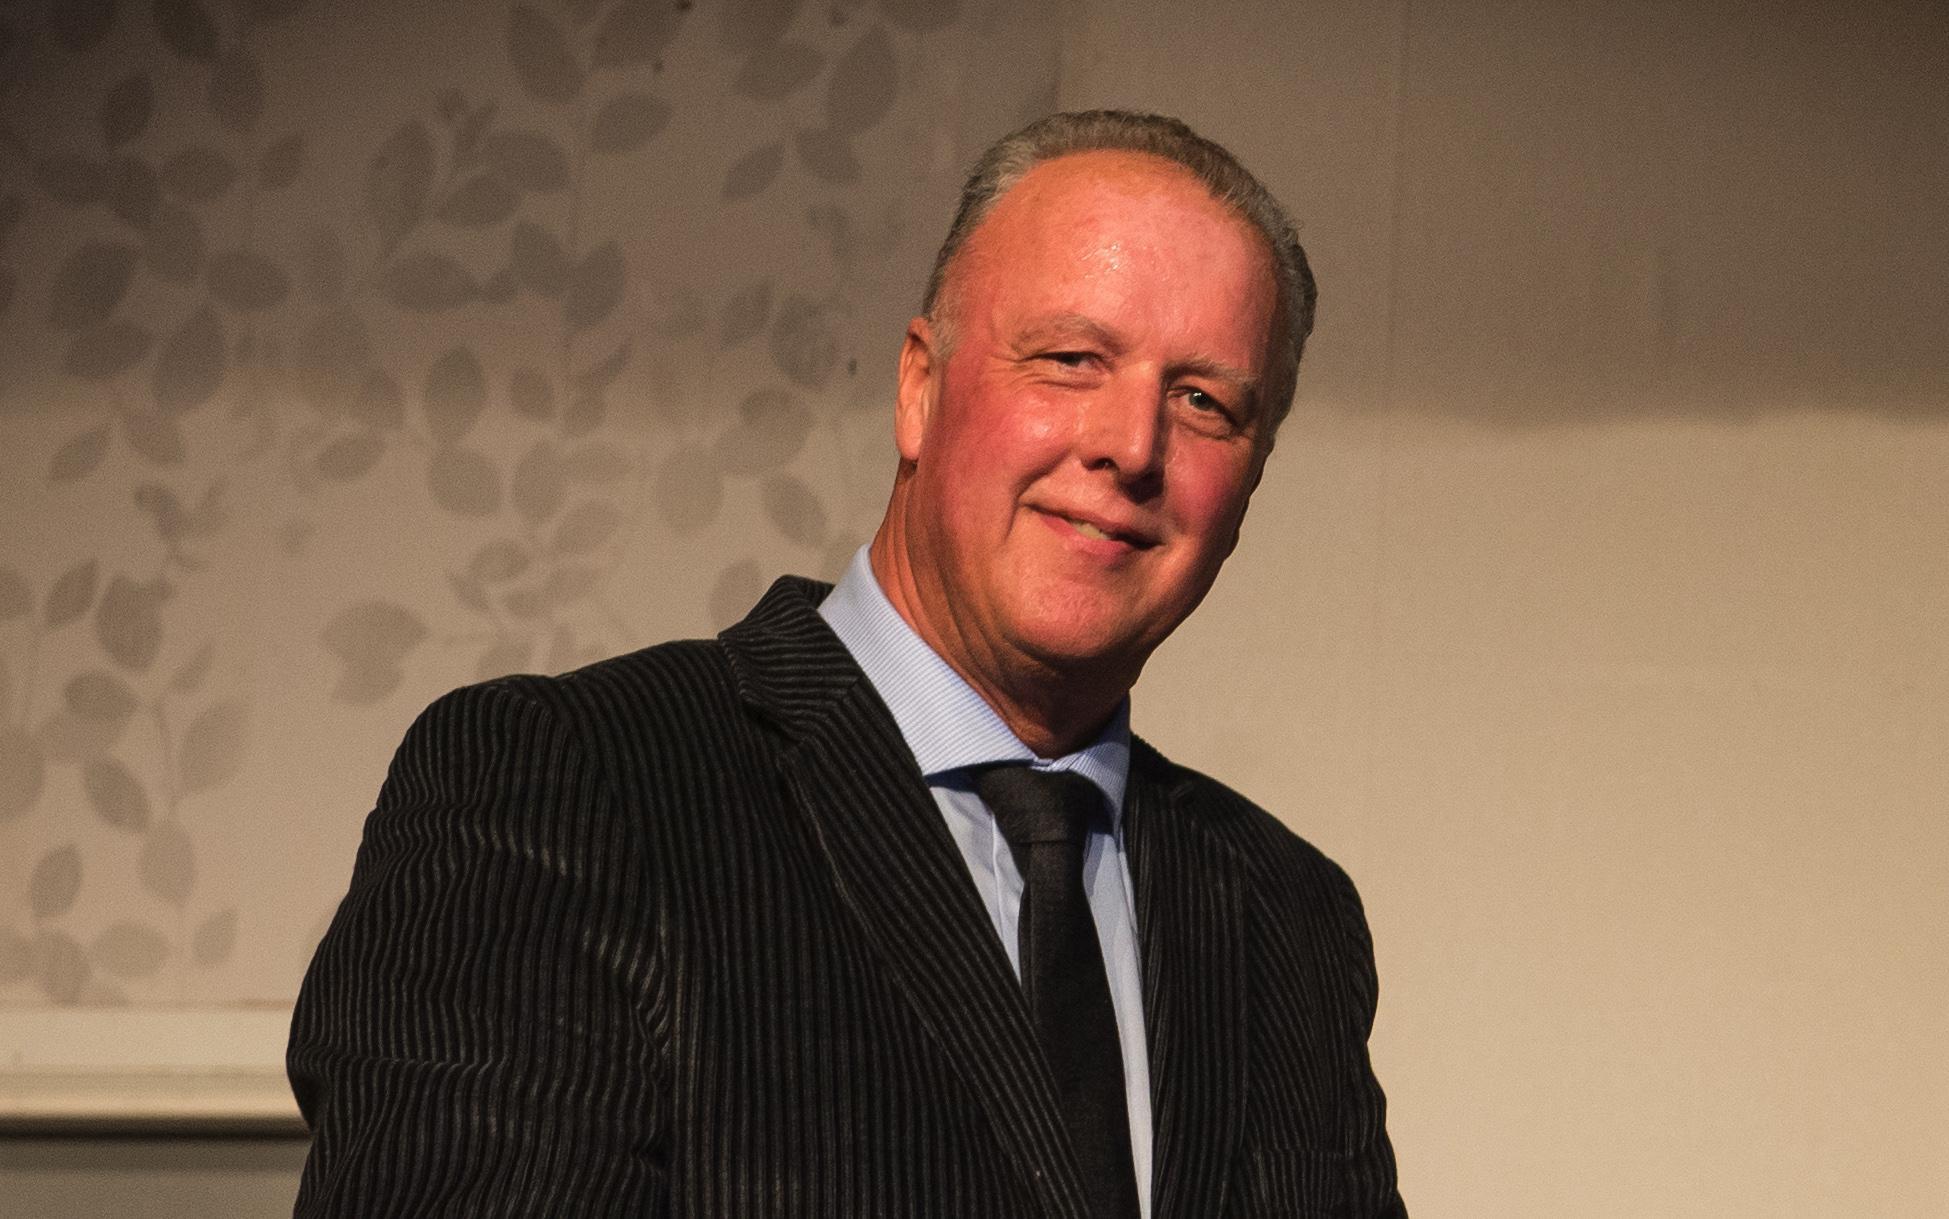 Wethouder Dick Butter weer aan de slag in Beemster, Jan Houtenbos doet stapje terug